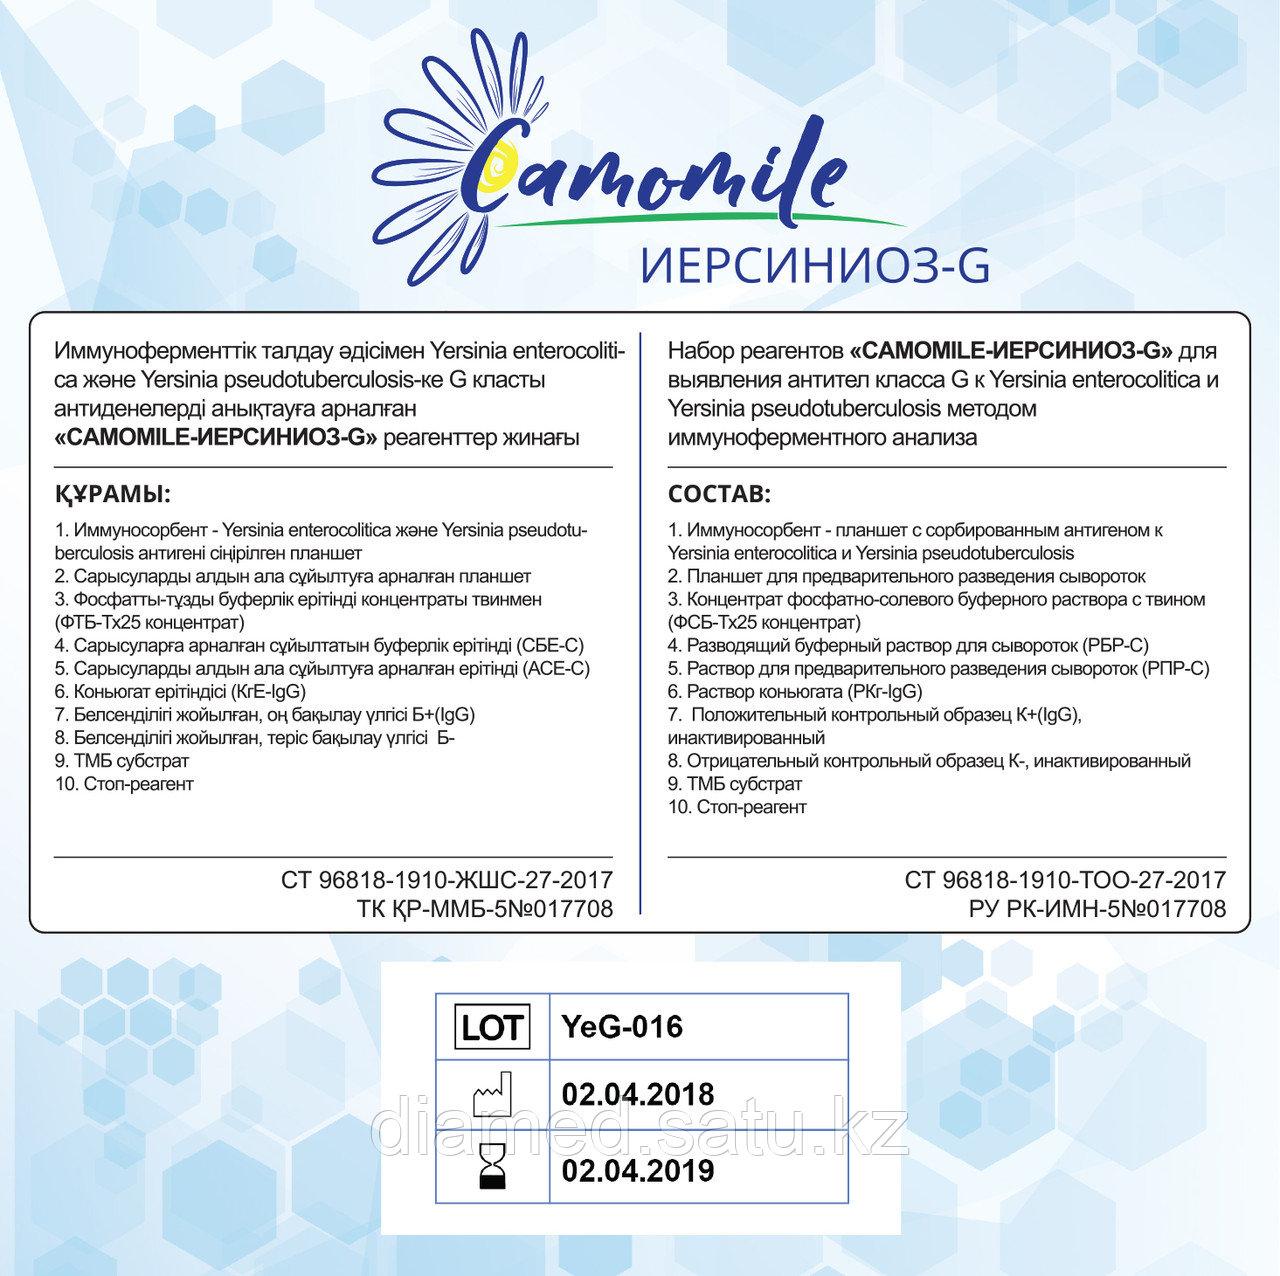 ИФА реагенты CAMOMILE-Иерсиниоз-G